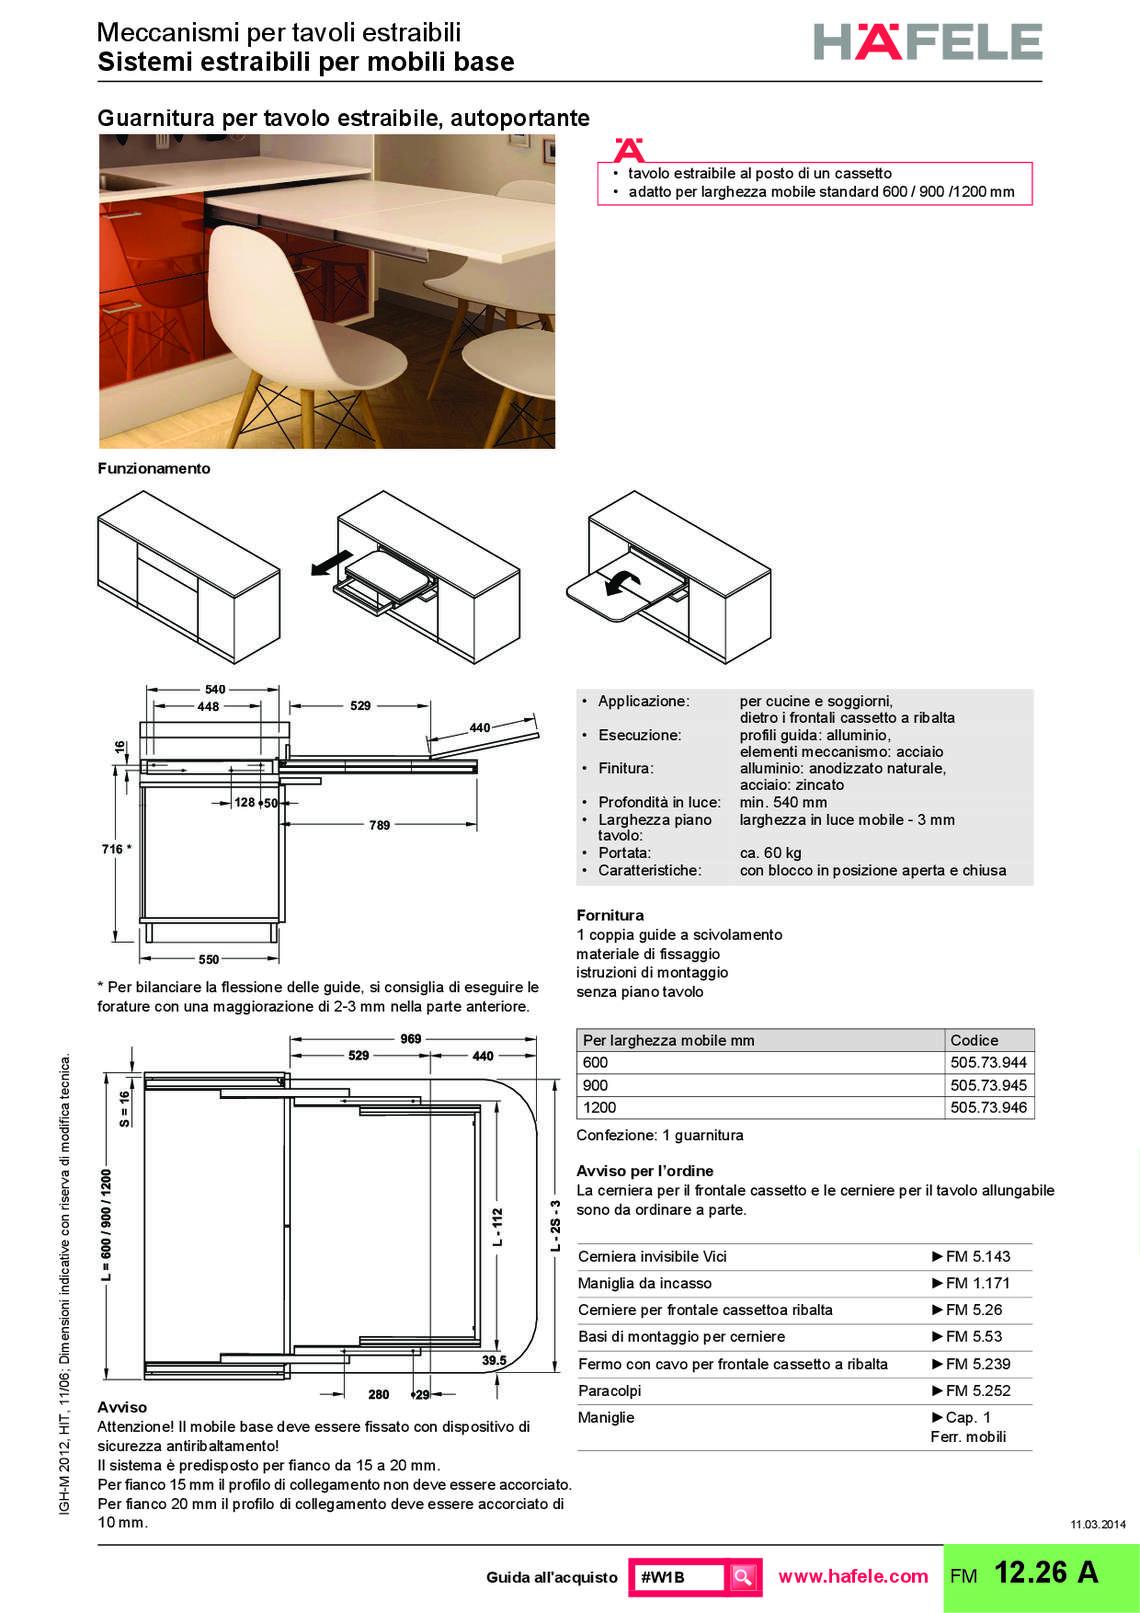 hafele-sottostrutture-per-mobili_83_046.jpg